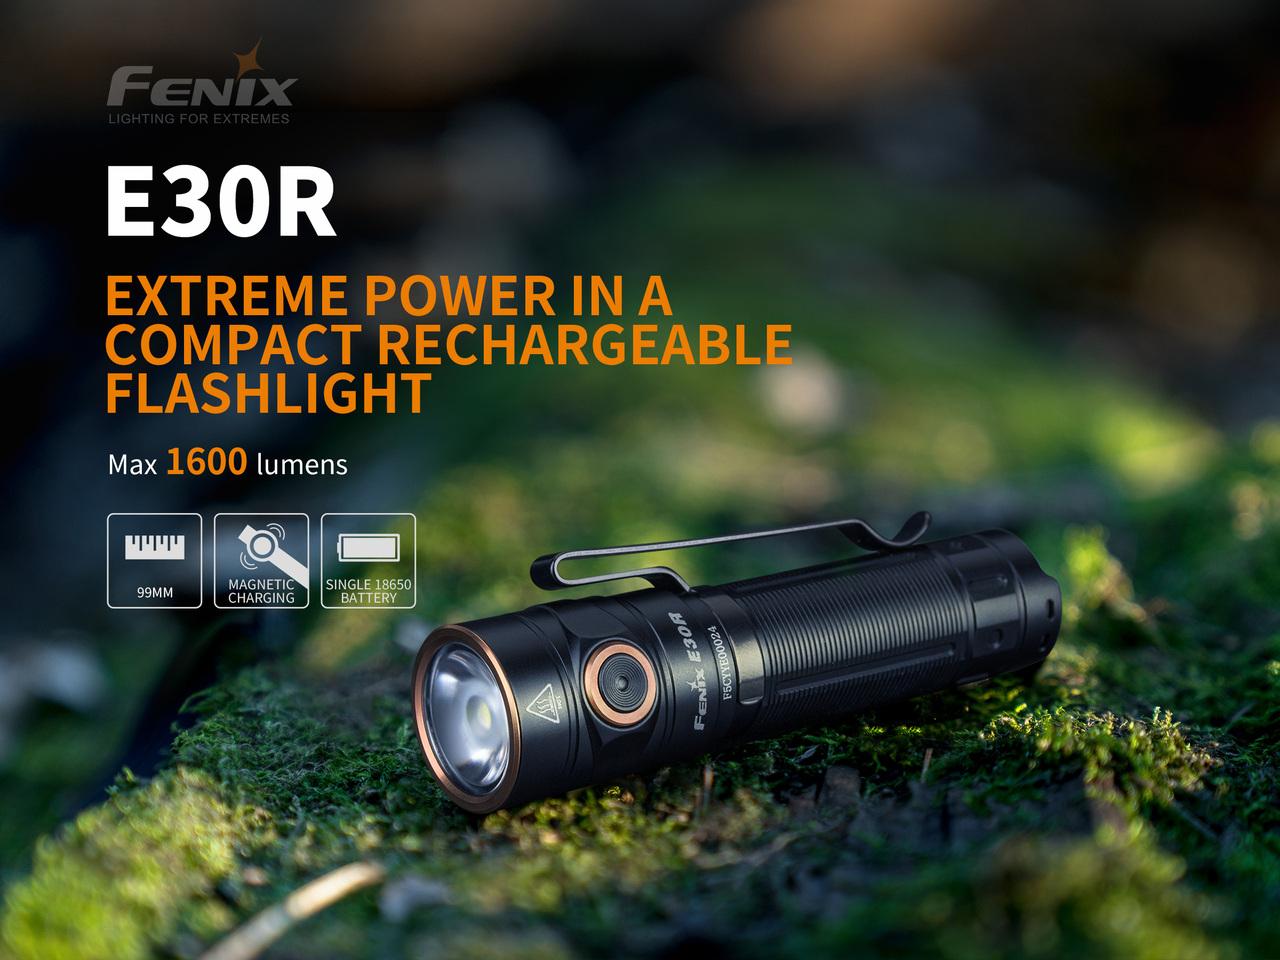 fenix e30r edc rechargeable flashlight